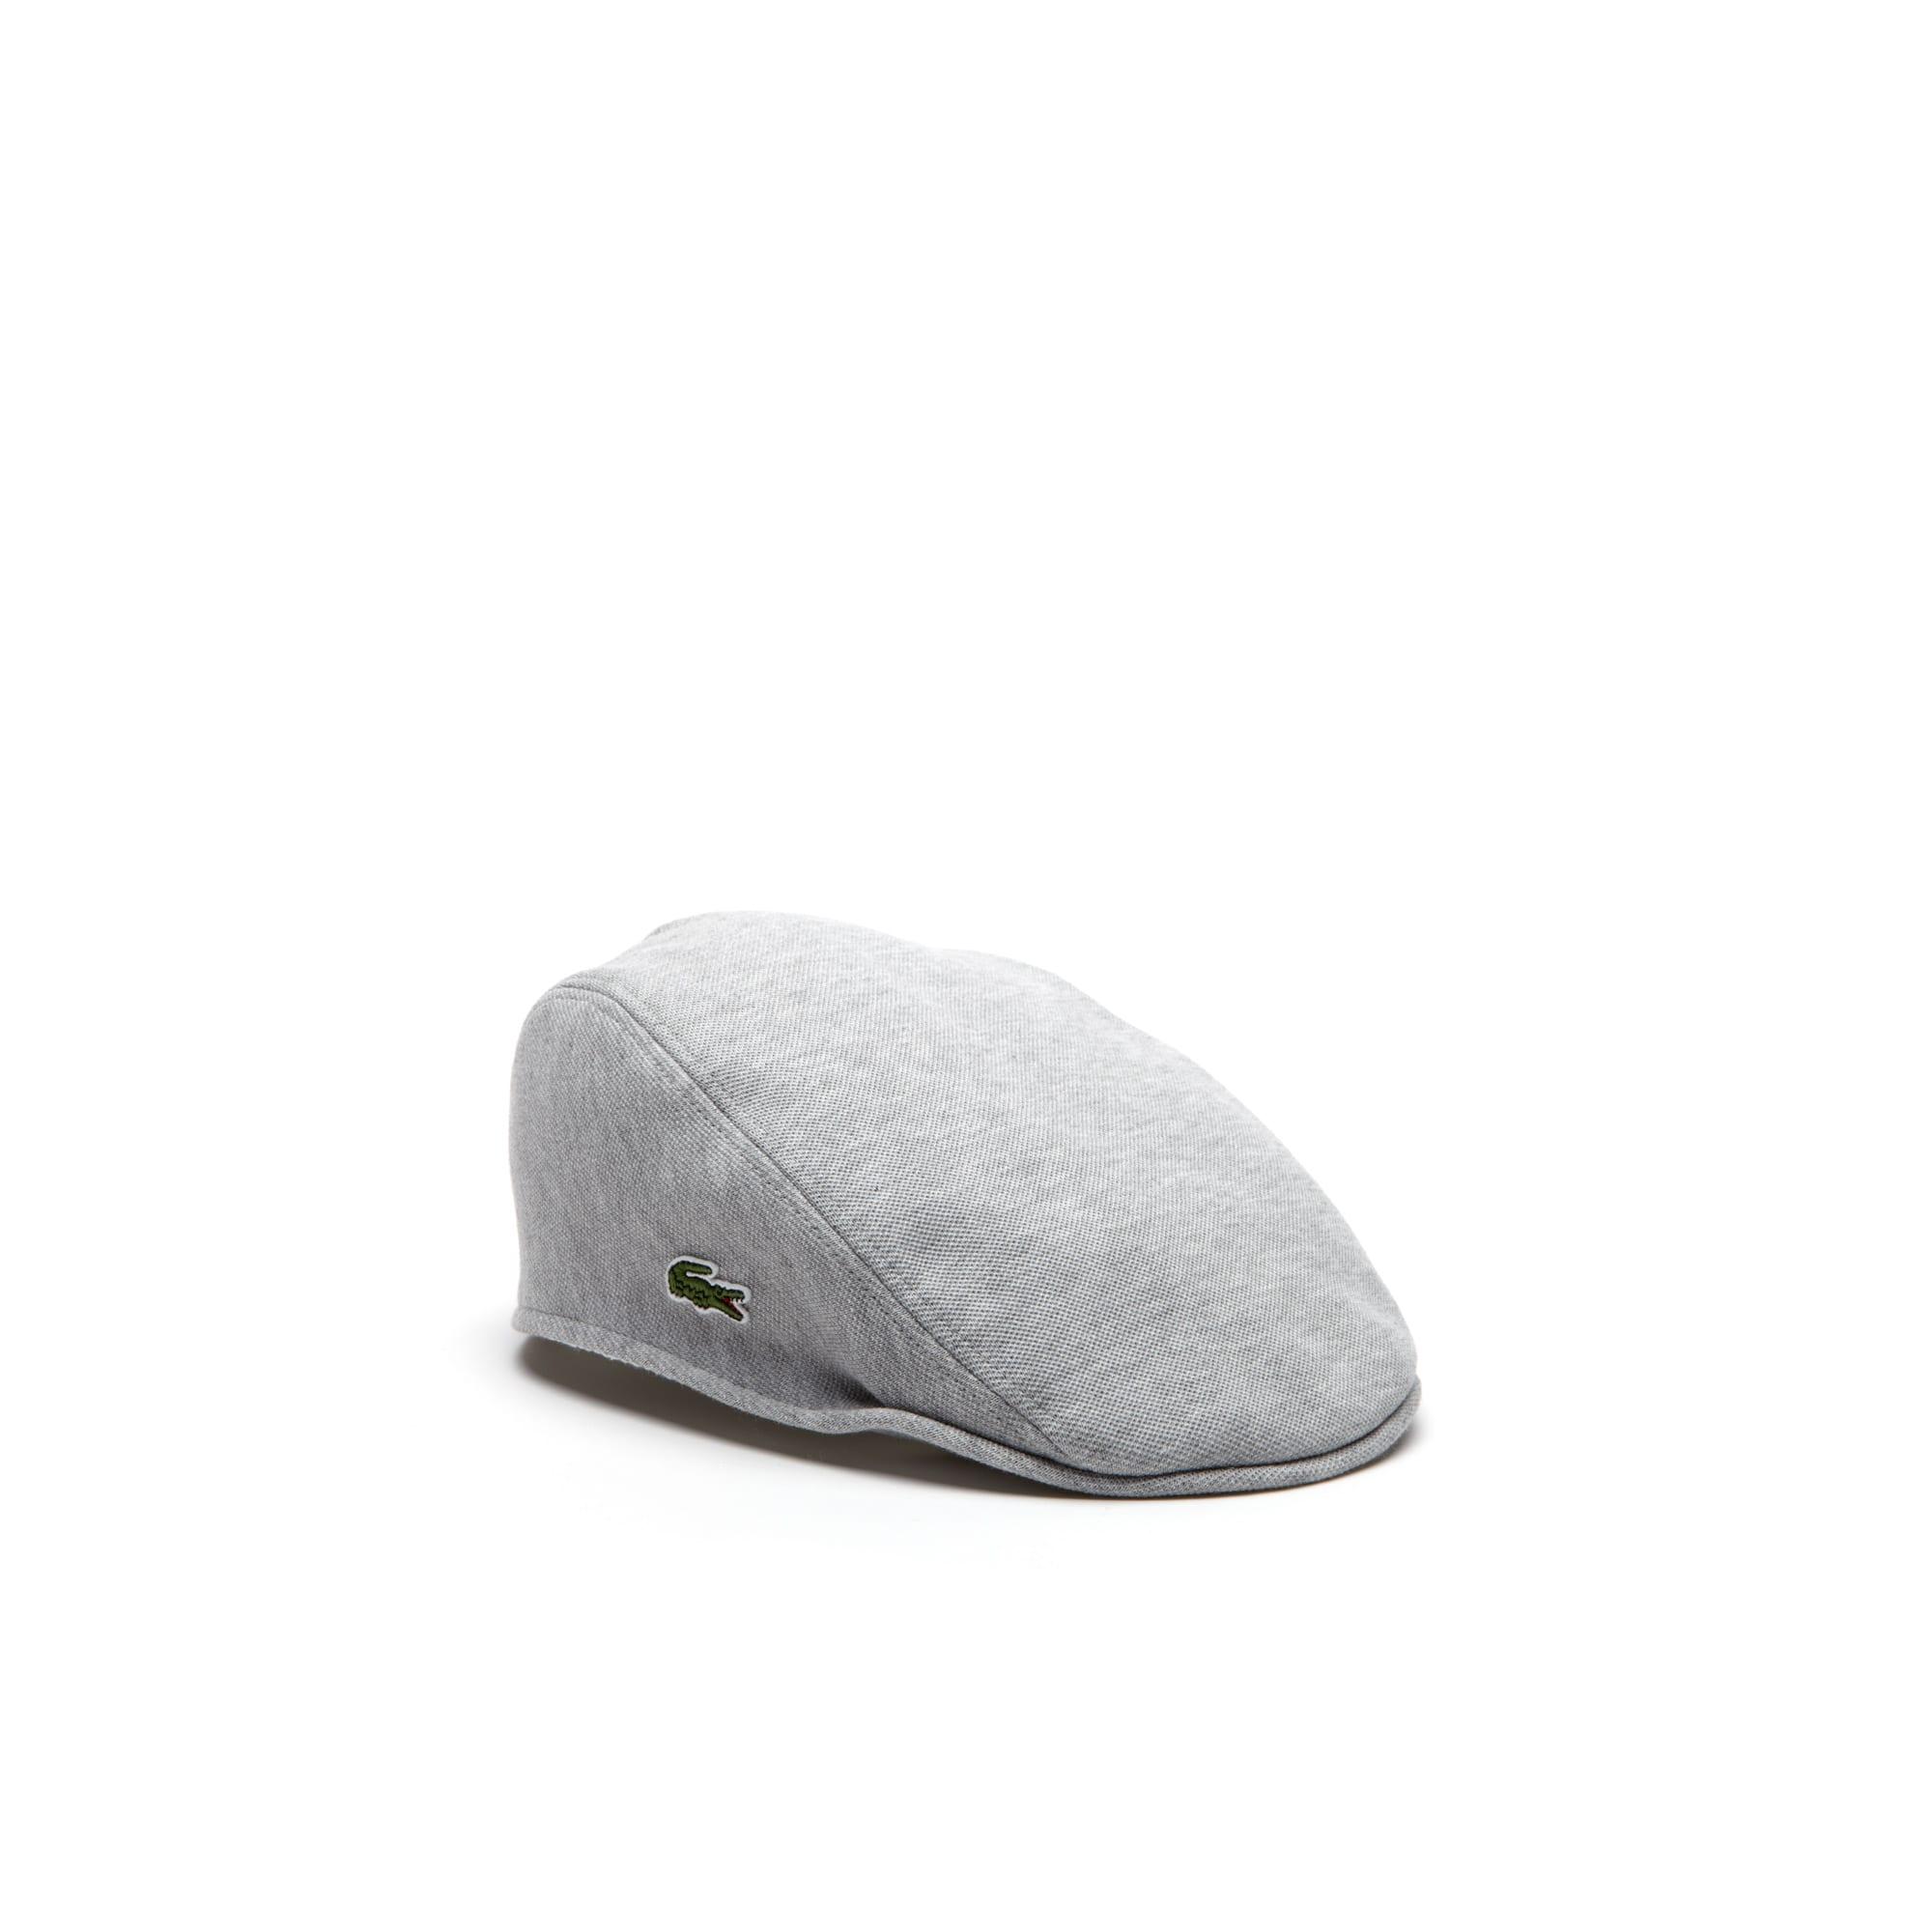 Men's Cotton flat cap